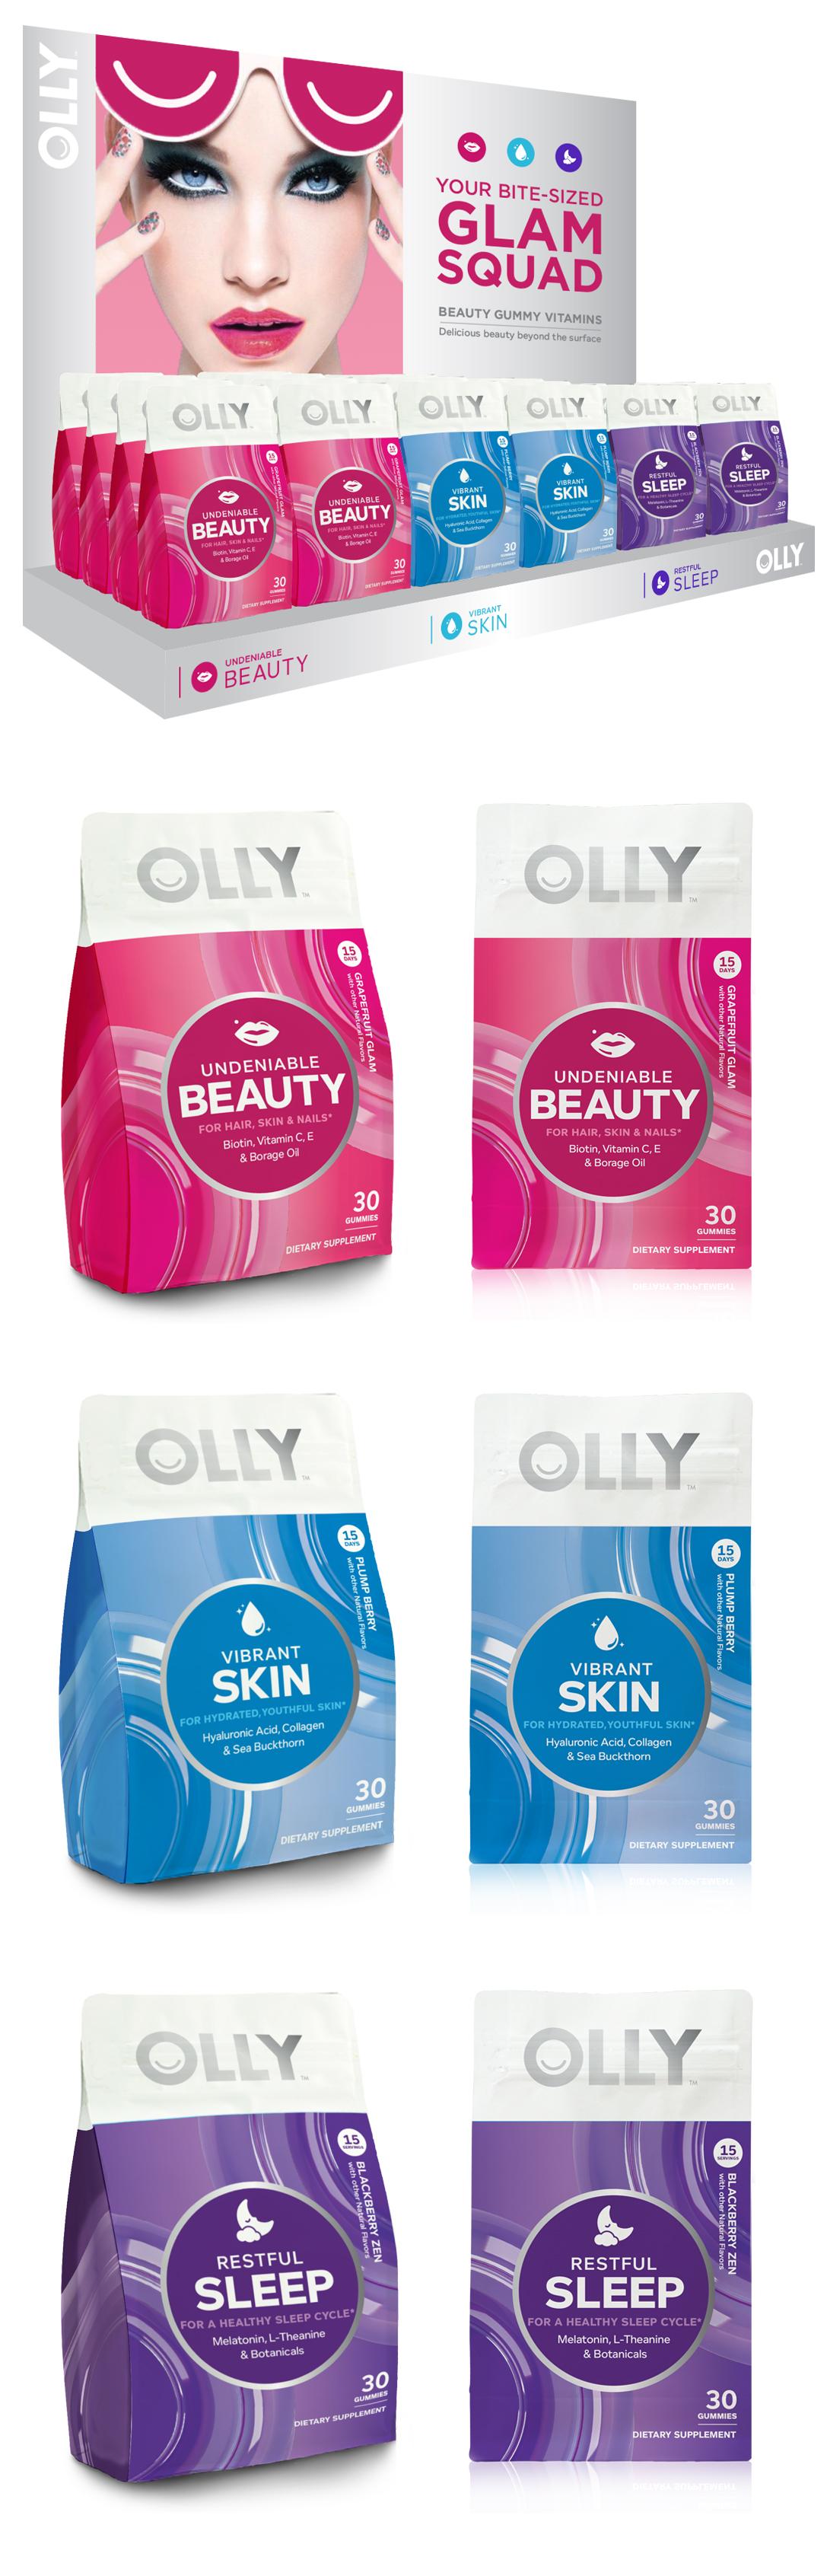 OLLY_beautypouches.jpg